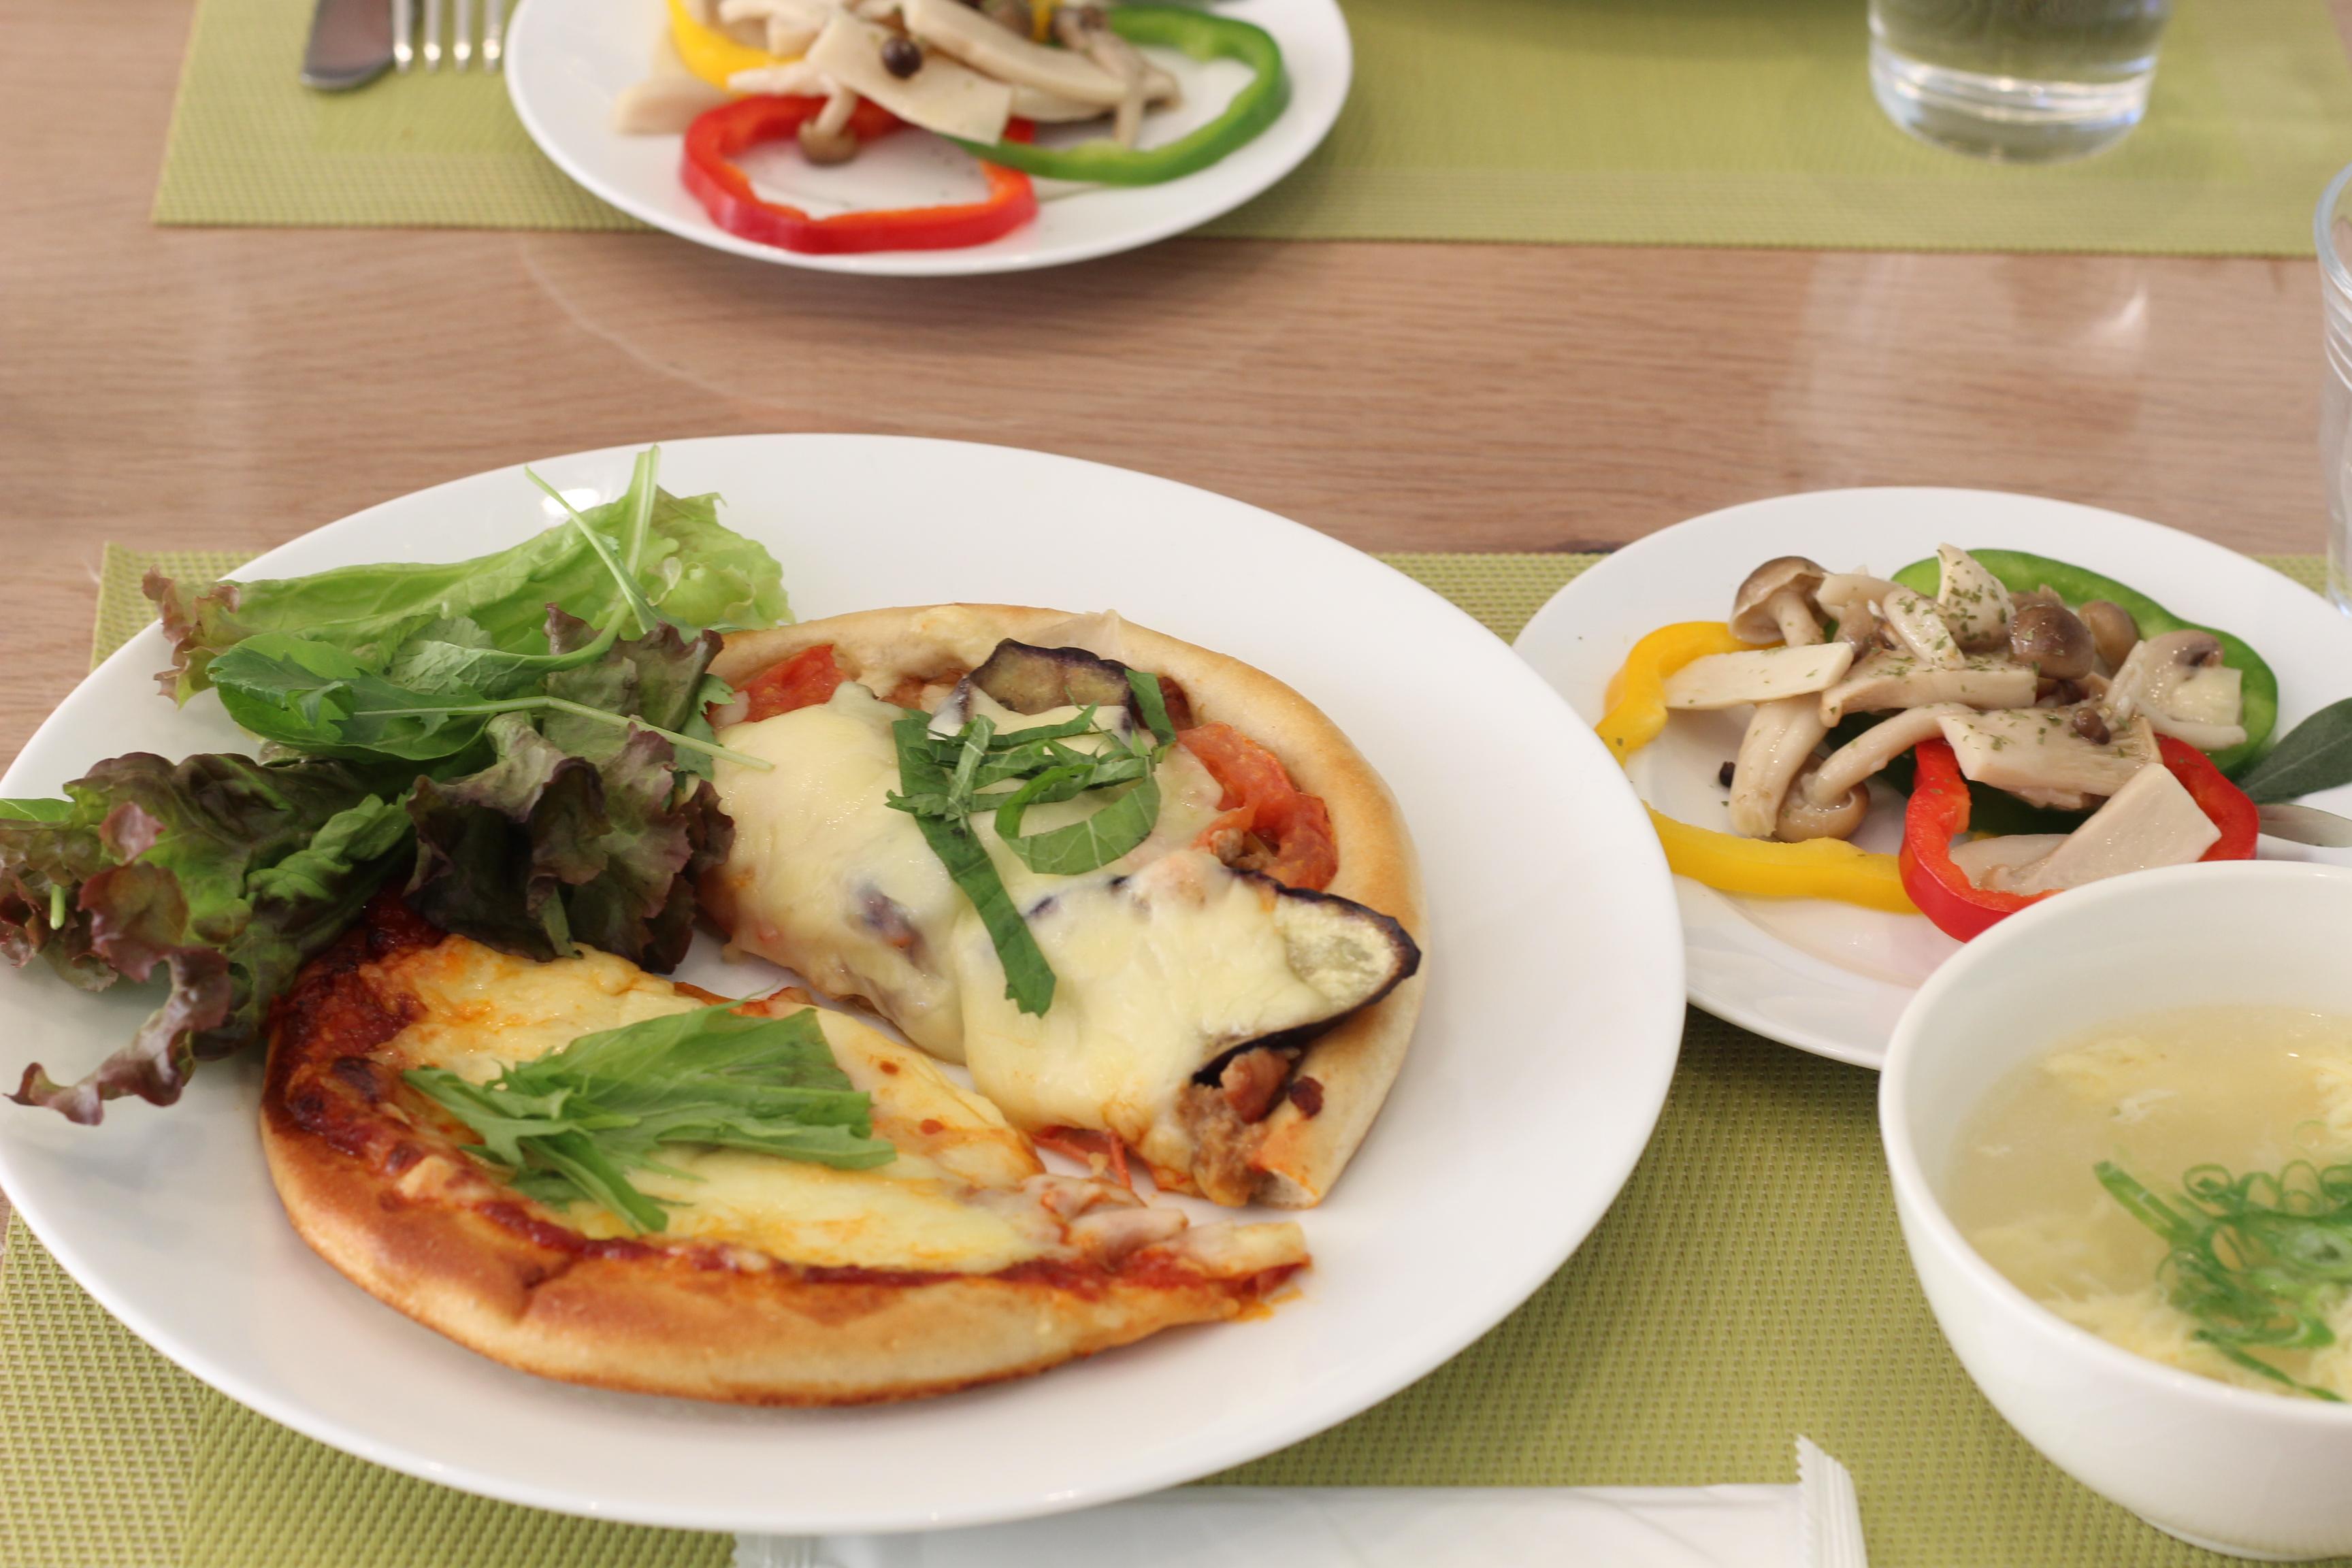 a-ta-sante糖質制限パン料理教室、京都江部粉糖質制限シフォンケーキ&ピザ。